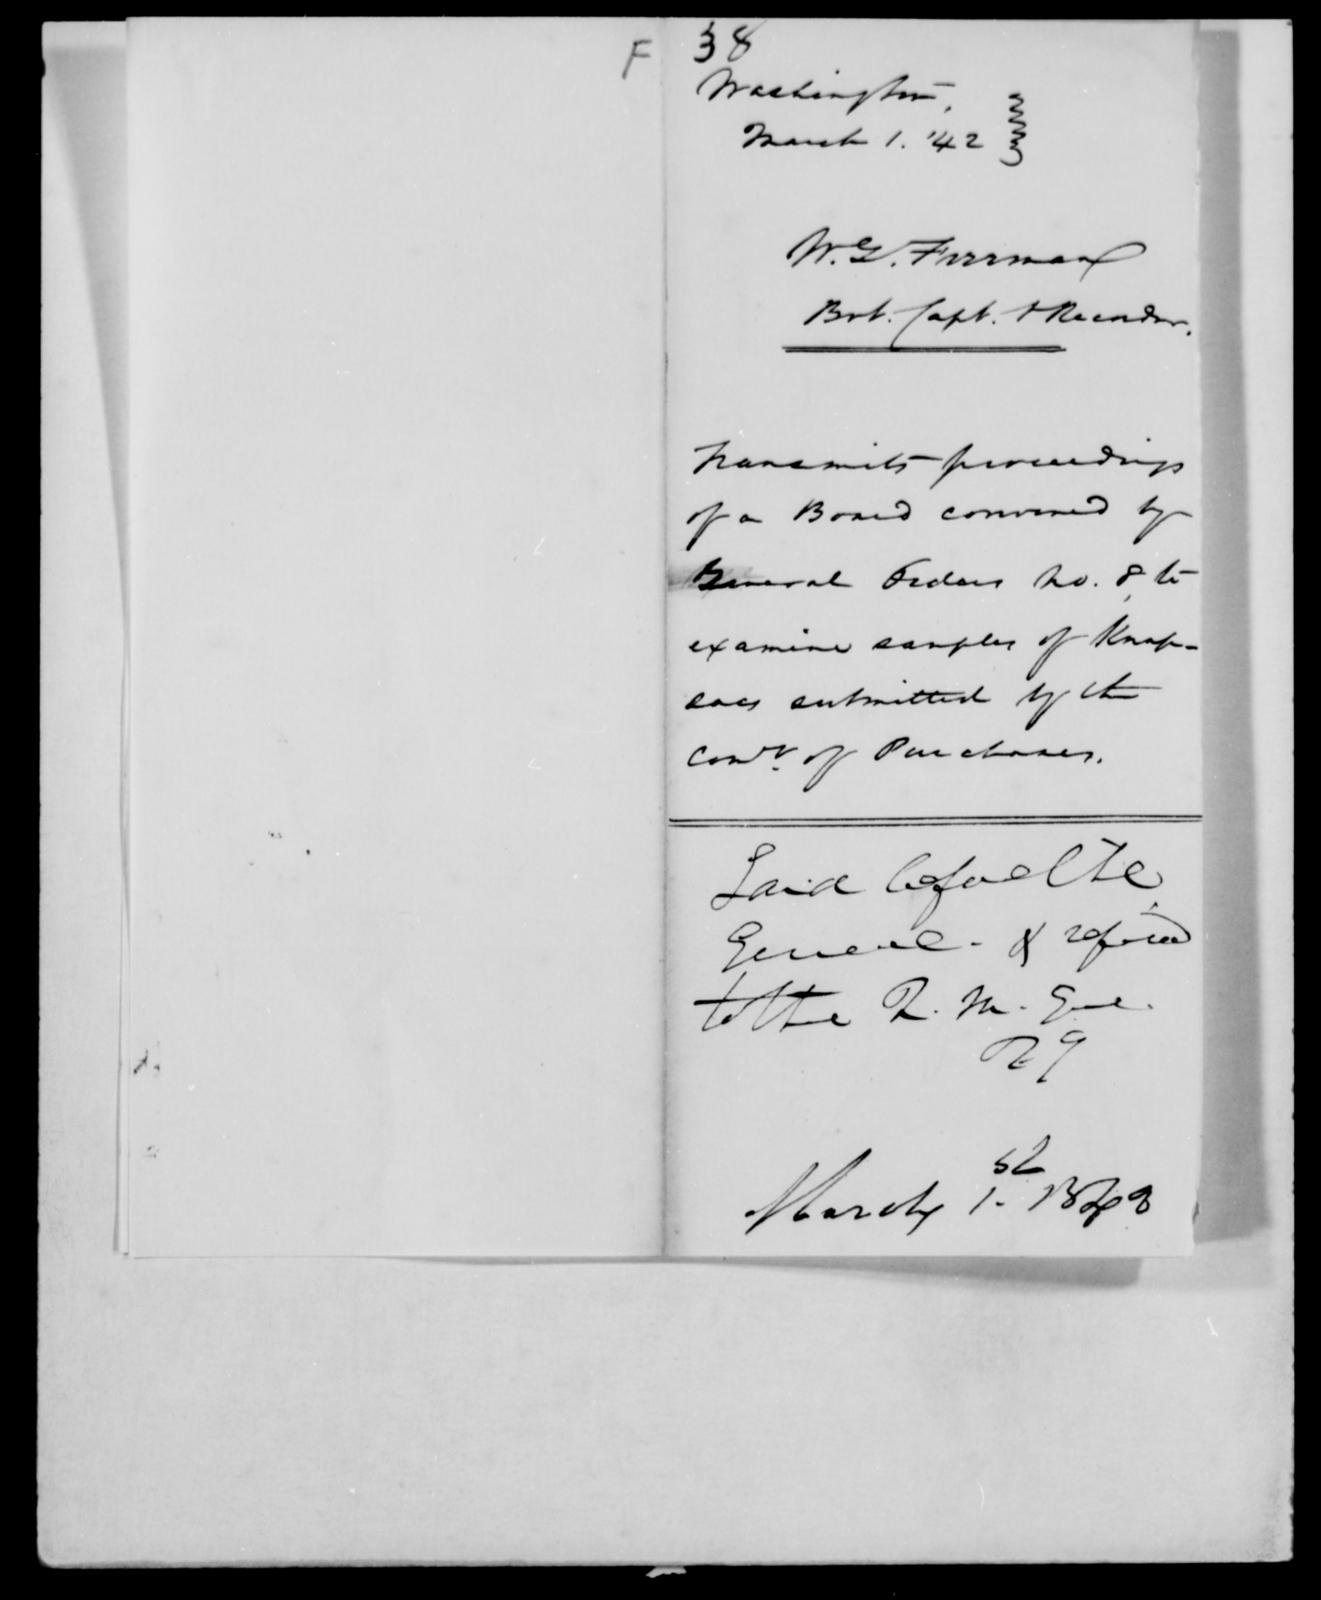 Firrman, W G - State: [Blank] - Year: 1842 - File Number: F38